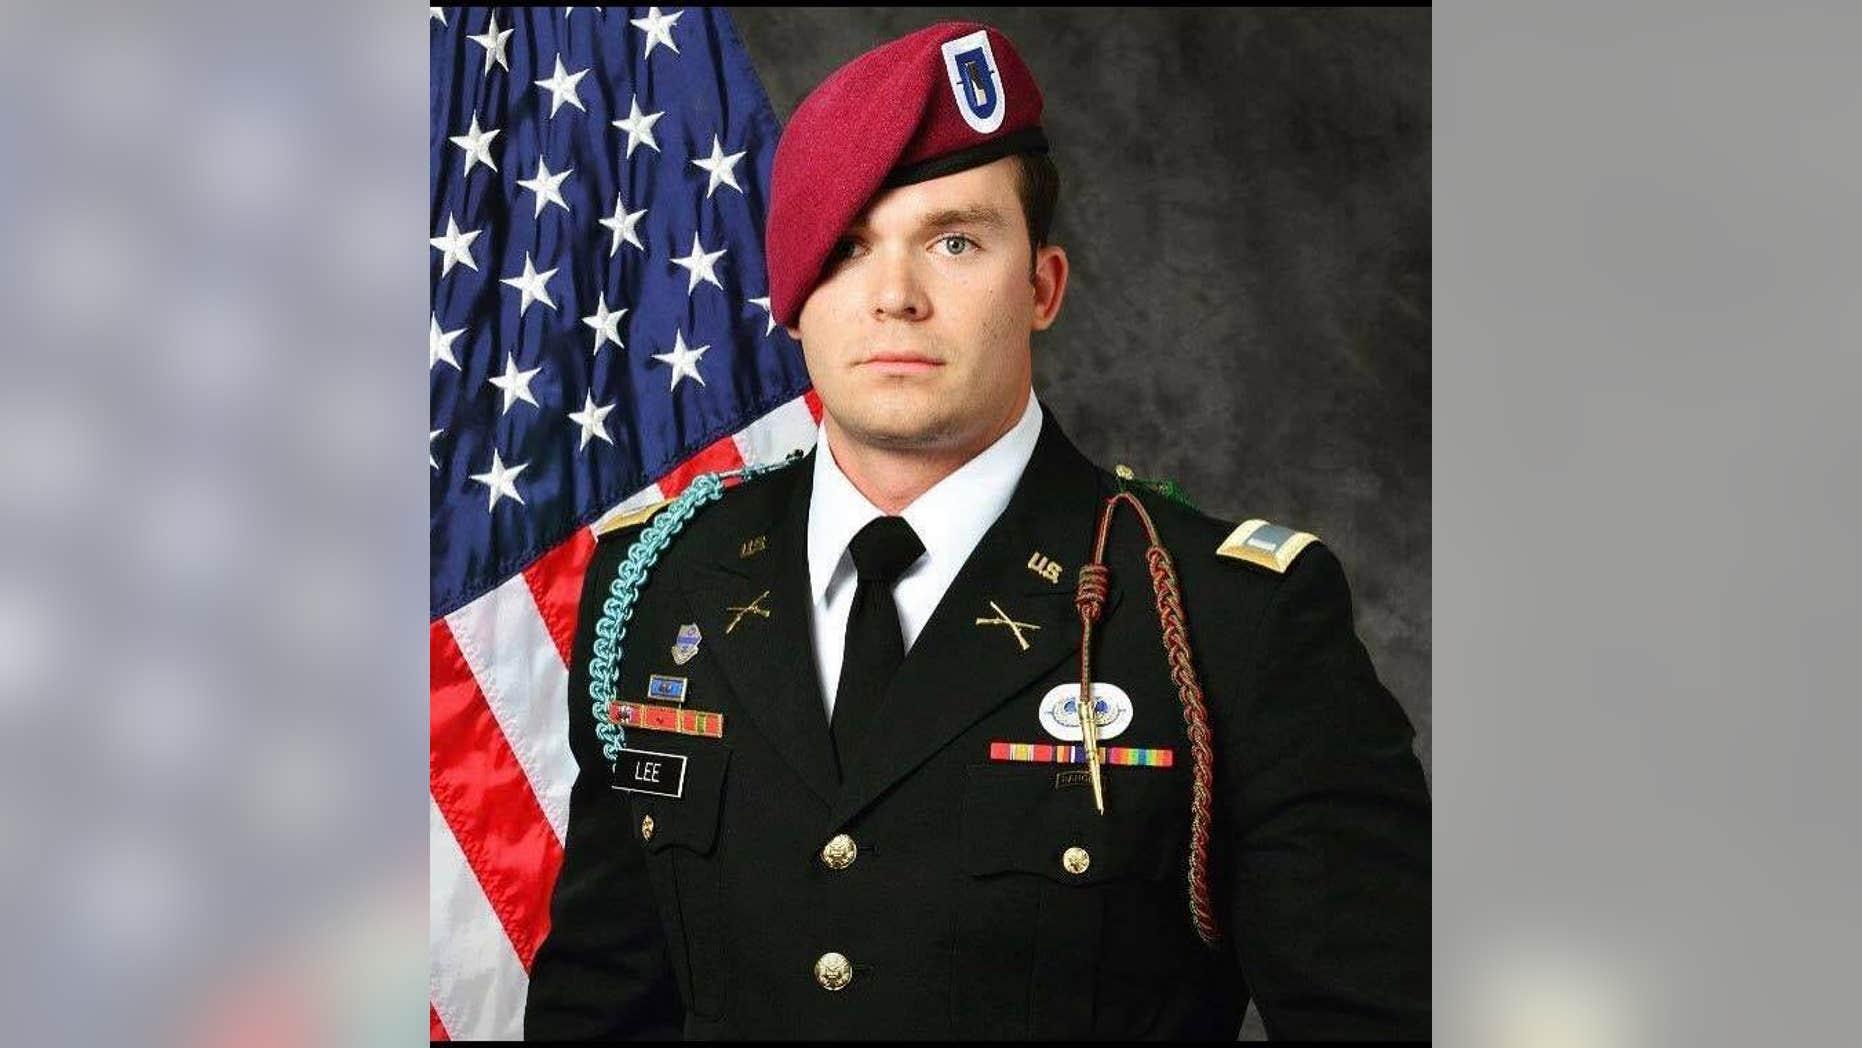 U.S. Army paratrooper Weston C. Lee was killed in Iraq on April 29.